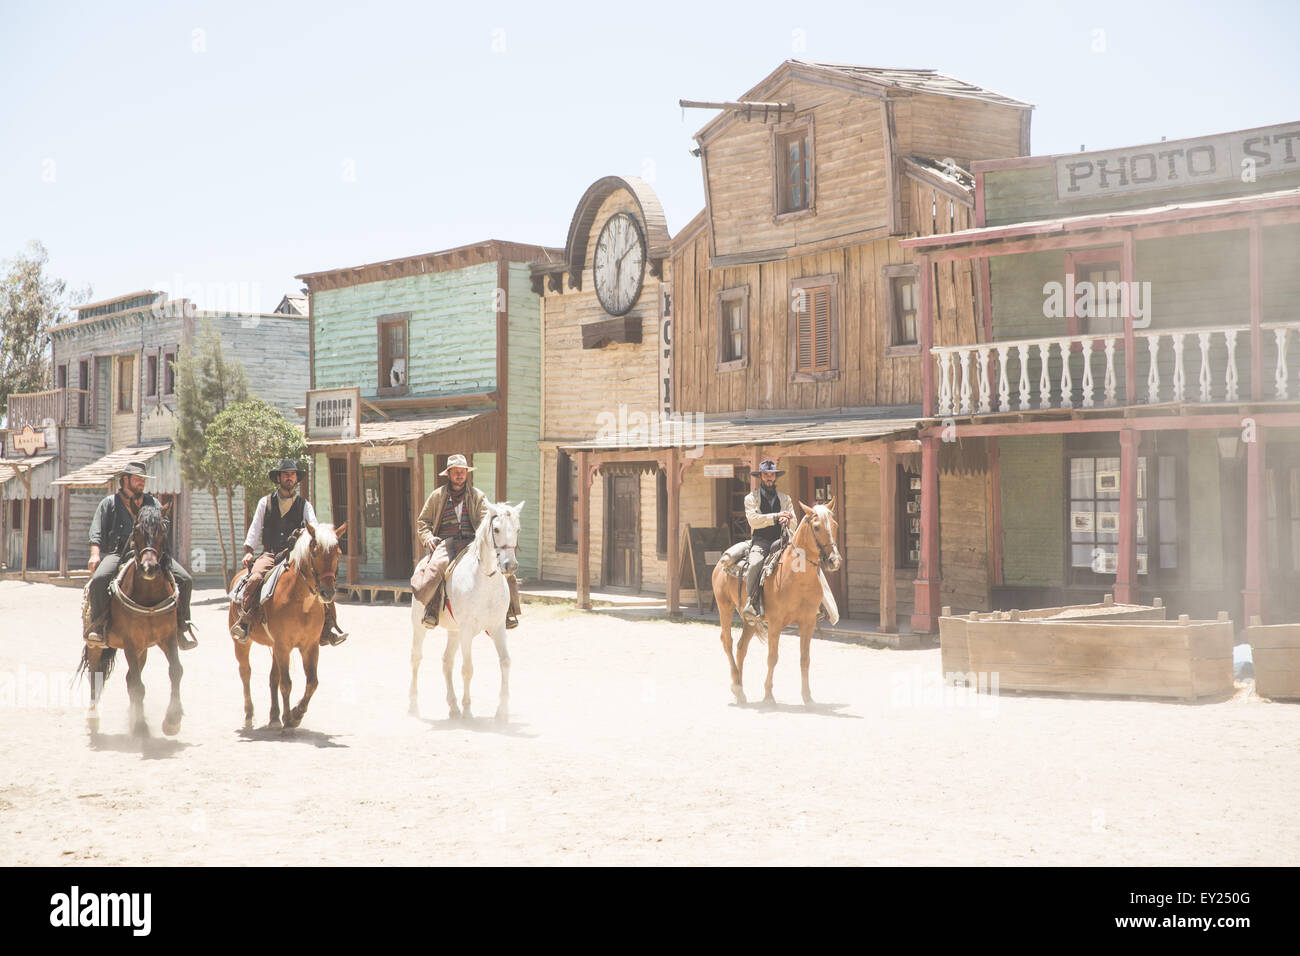 Gang of cowboys riding horses on wild west film set, Fort Bravo, Tabernas, Almeria, Spain - Stock Image